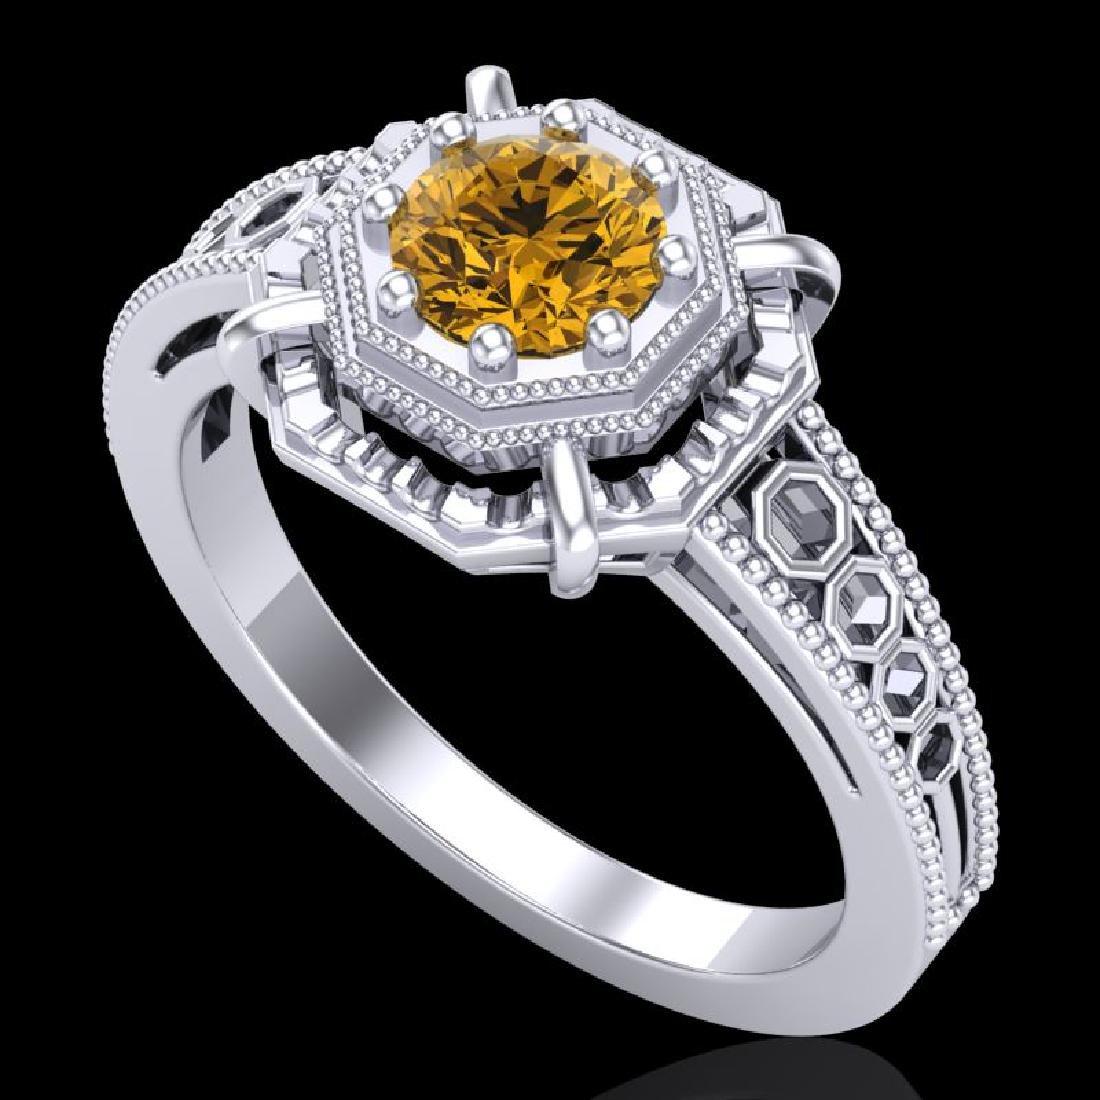 0.53 CTW Intense Fancy Yellow Diamond Engagement Art